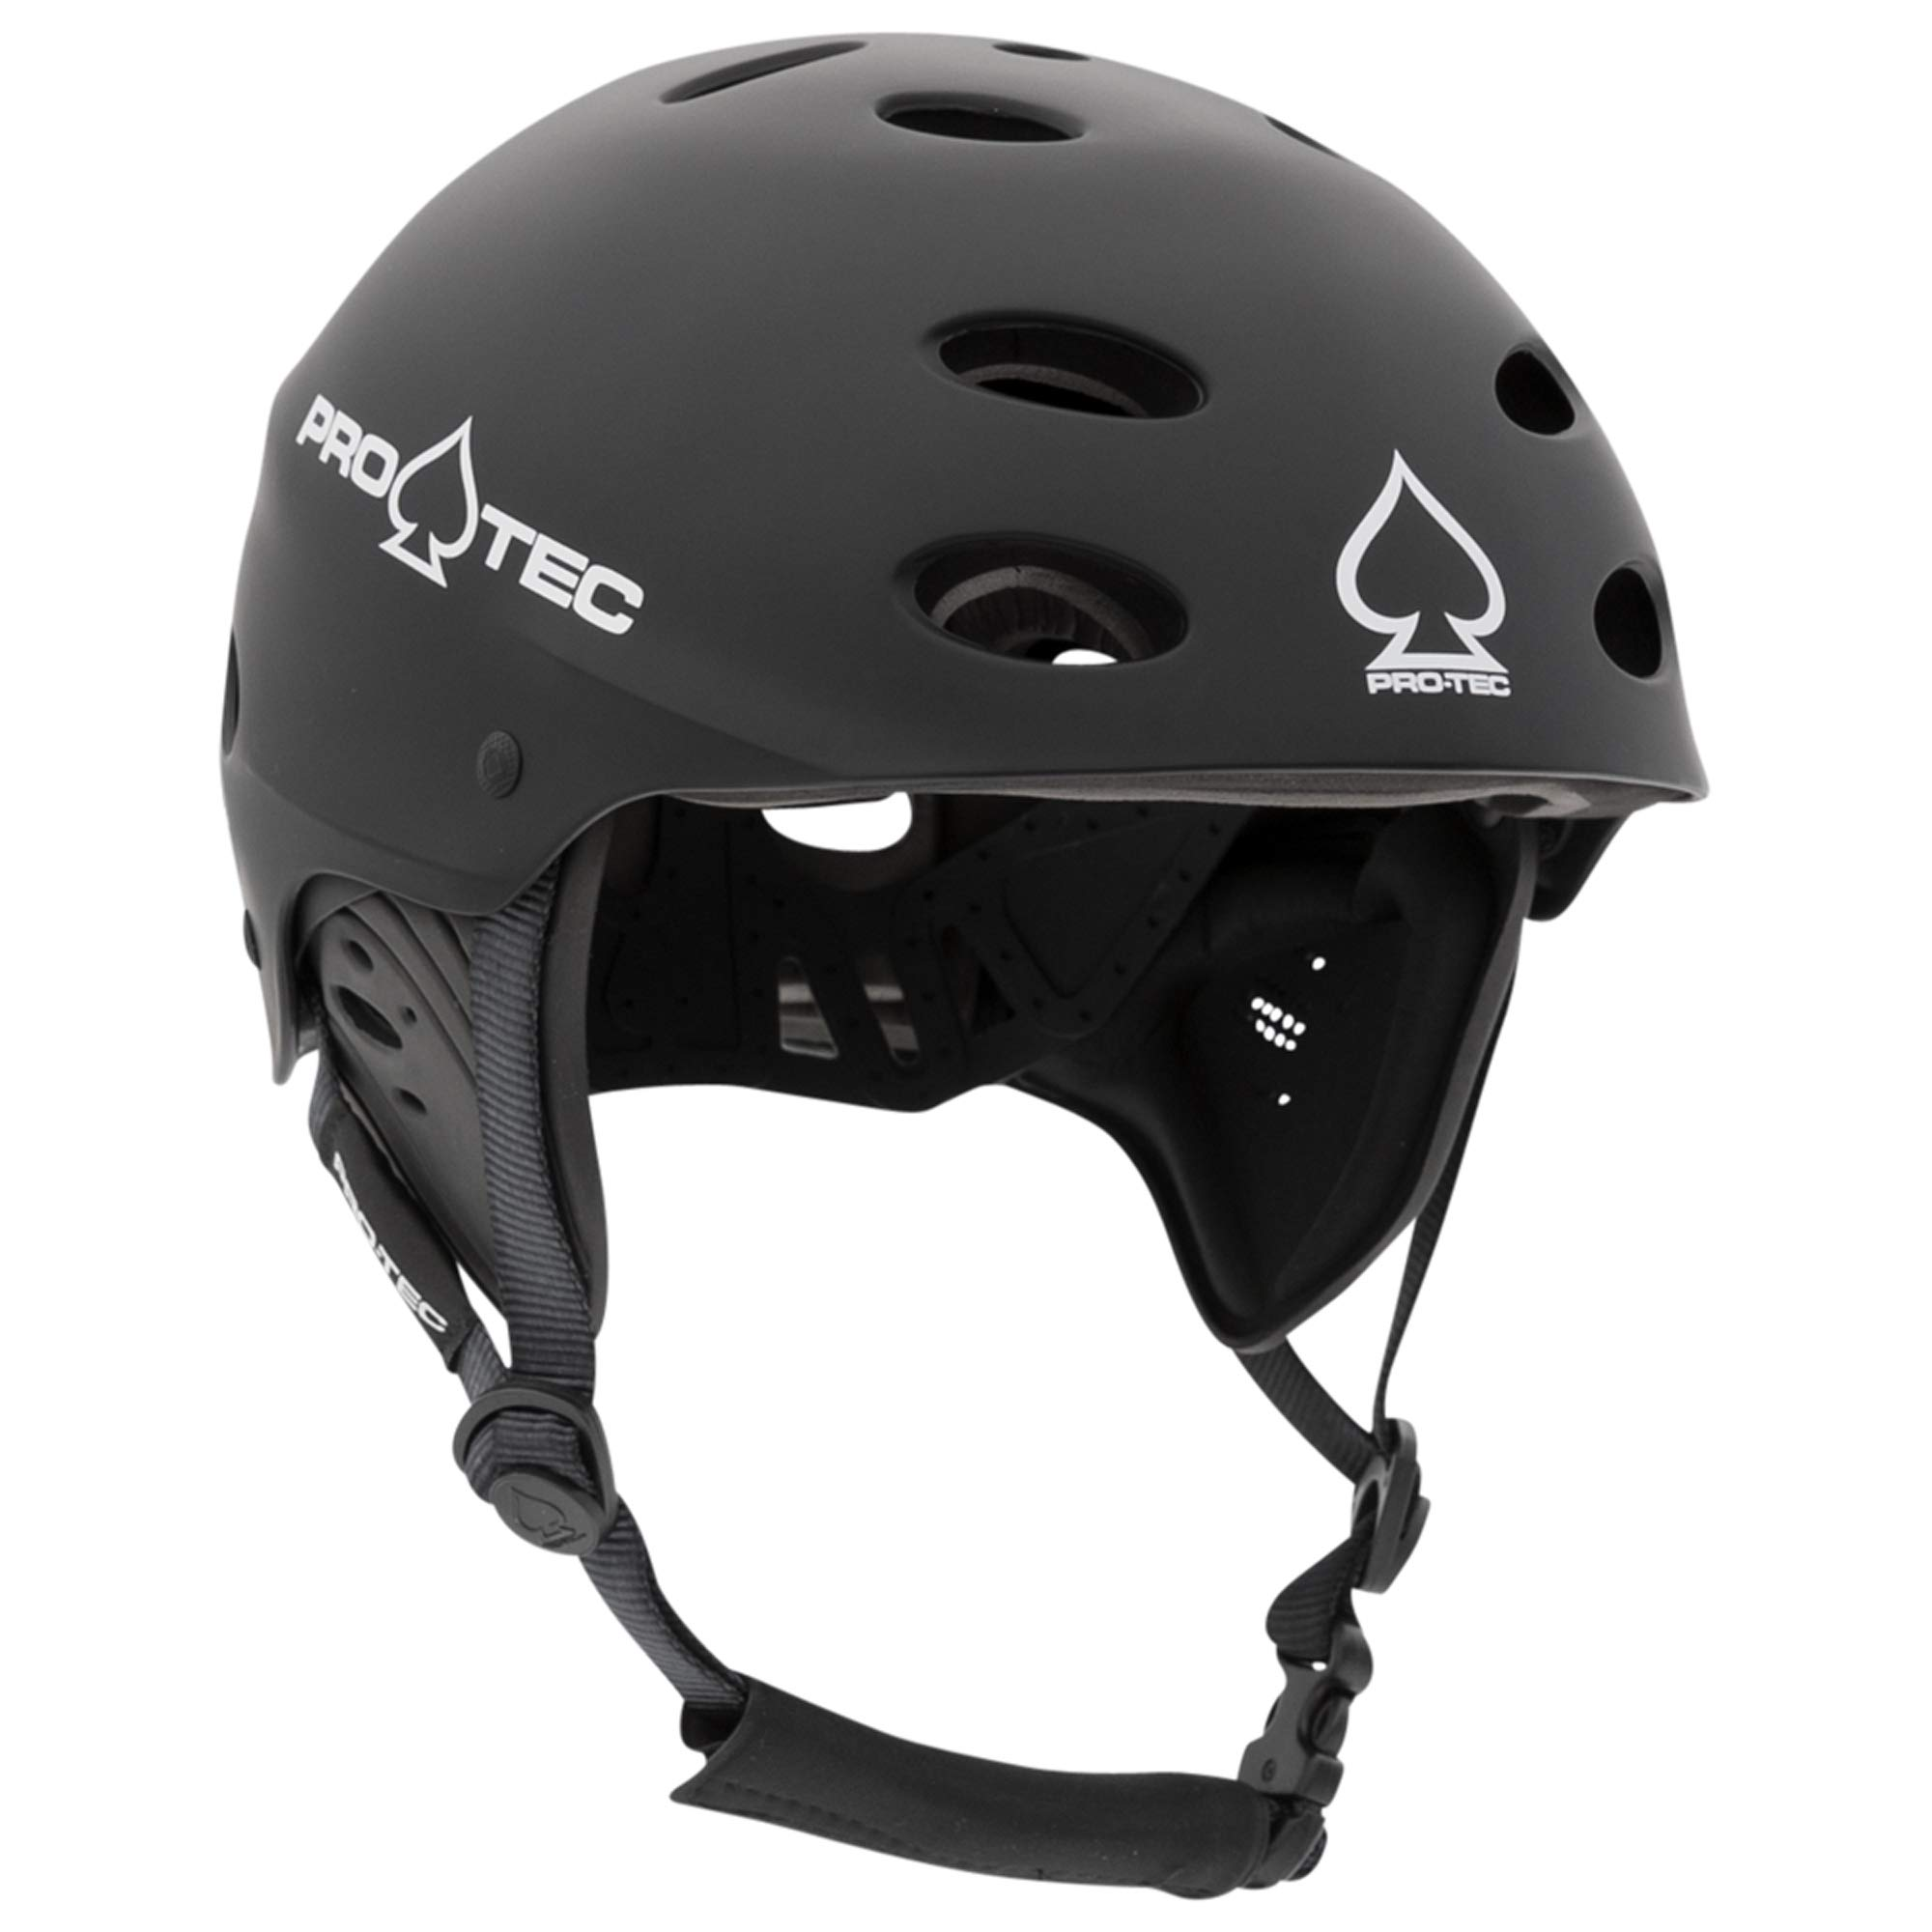 Pro-Tec Ace Wake Helmet, Matte Black, M by Pro-Tec